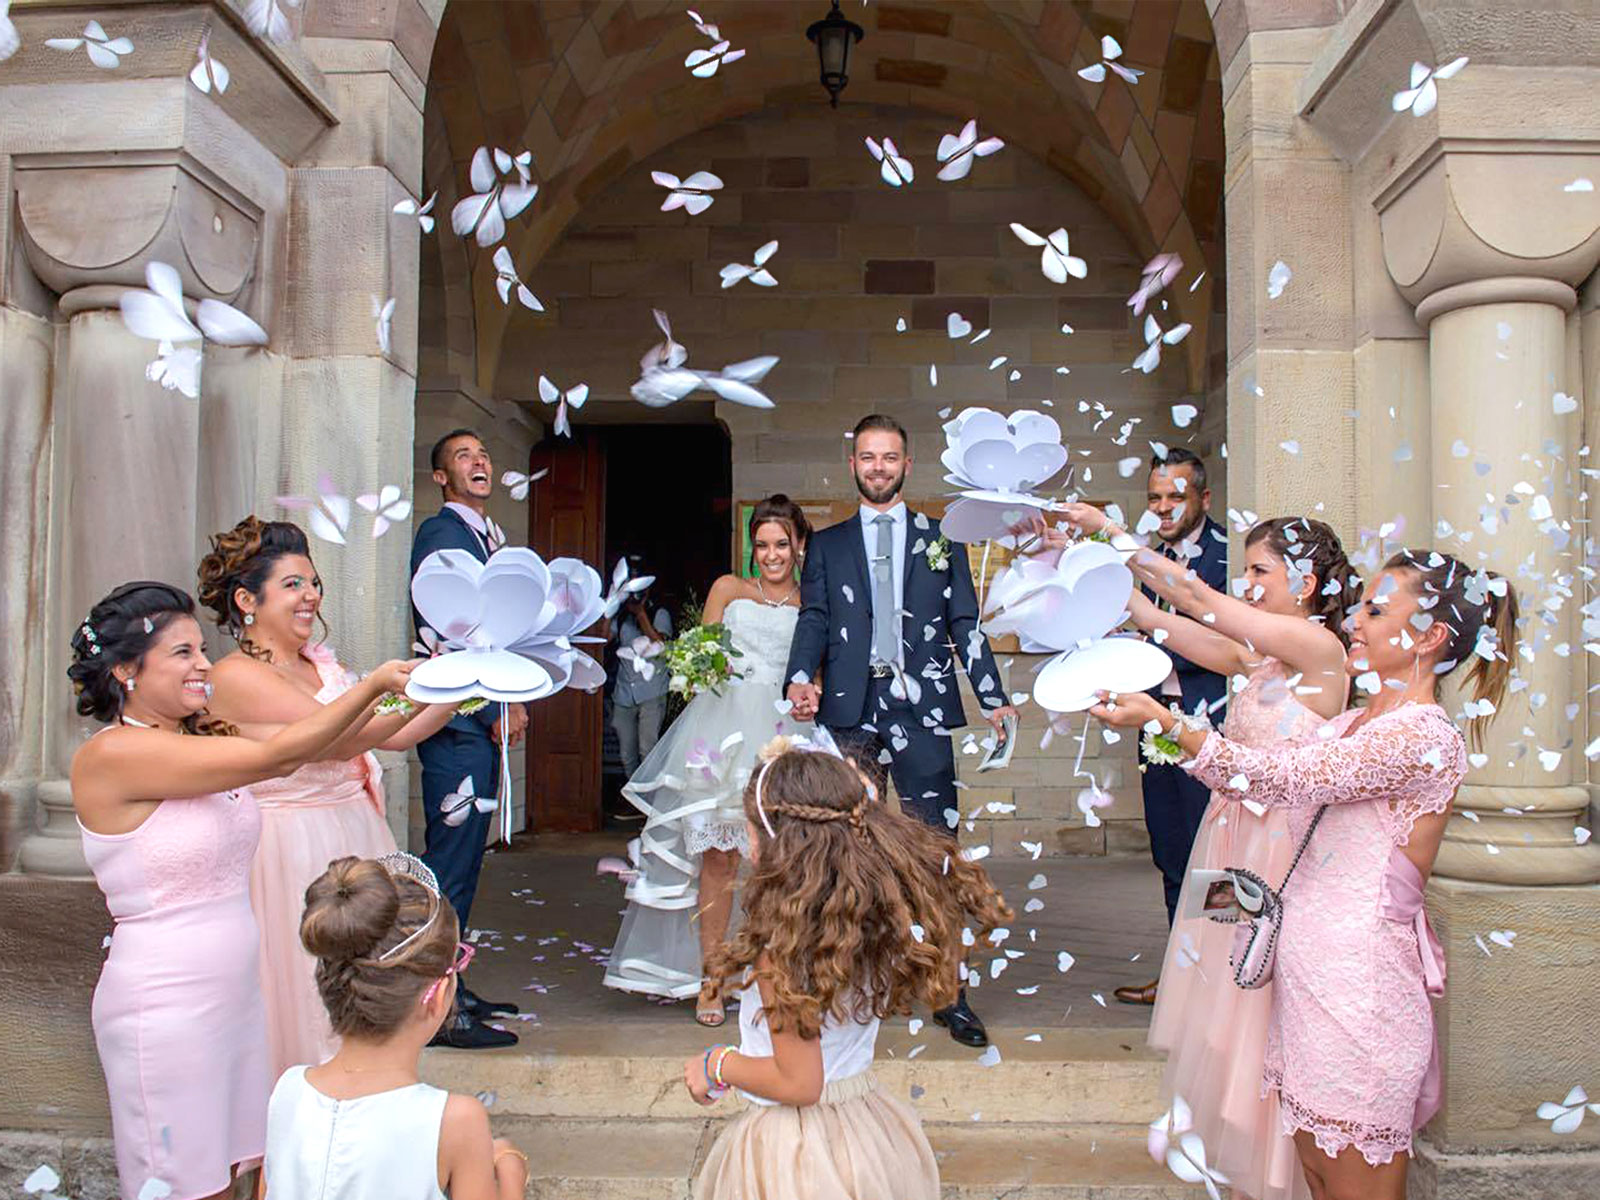 Magic Flyer Vlinder huwelijks welkom FR copyright sendyouhappiness.com